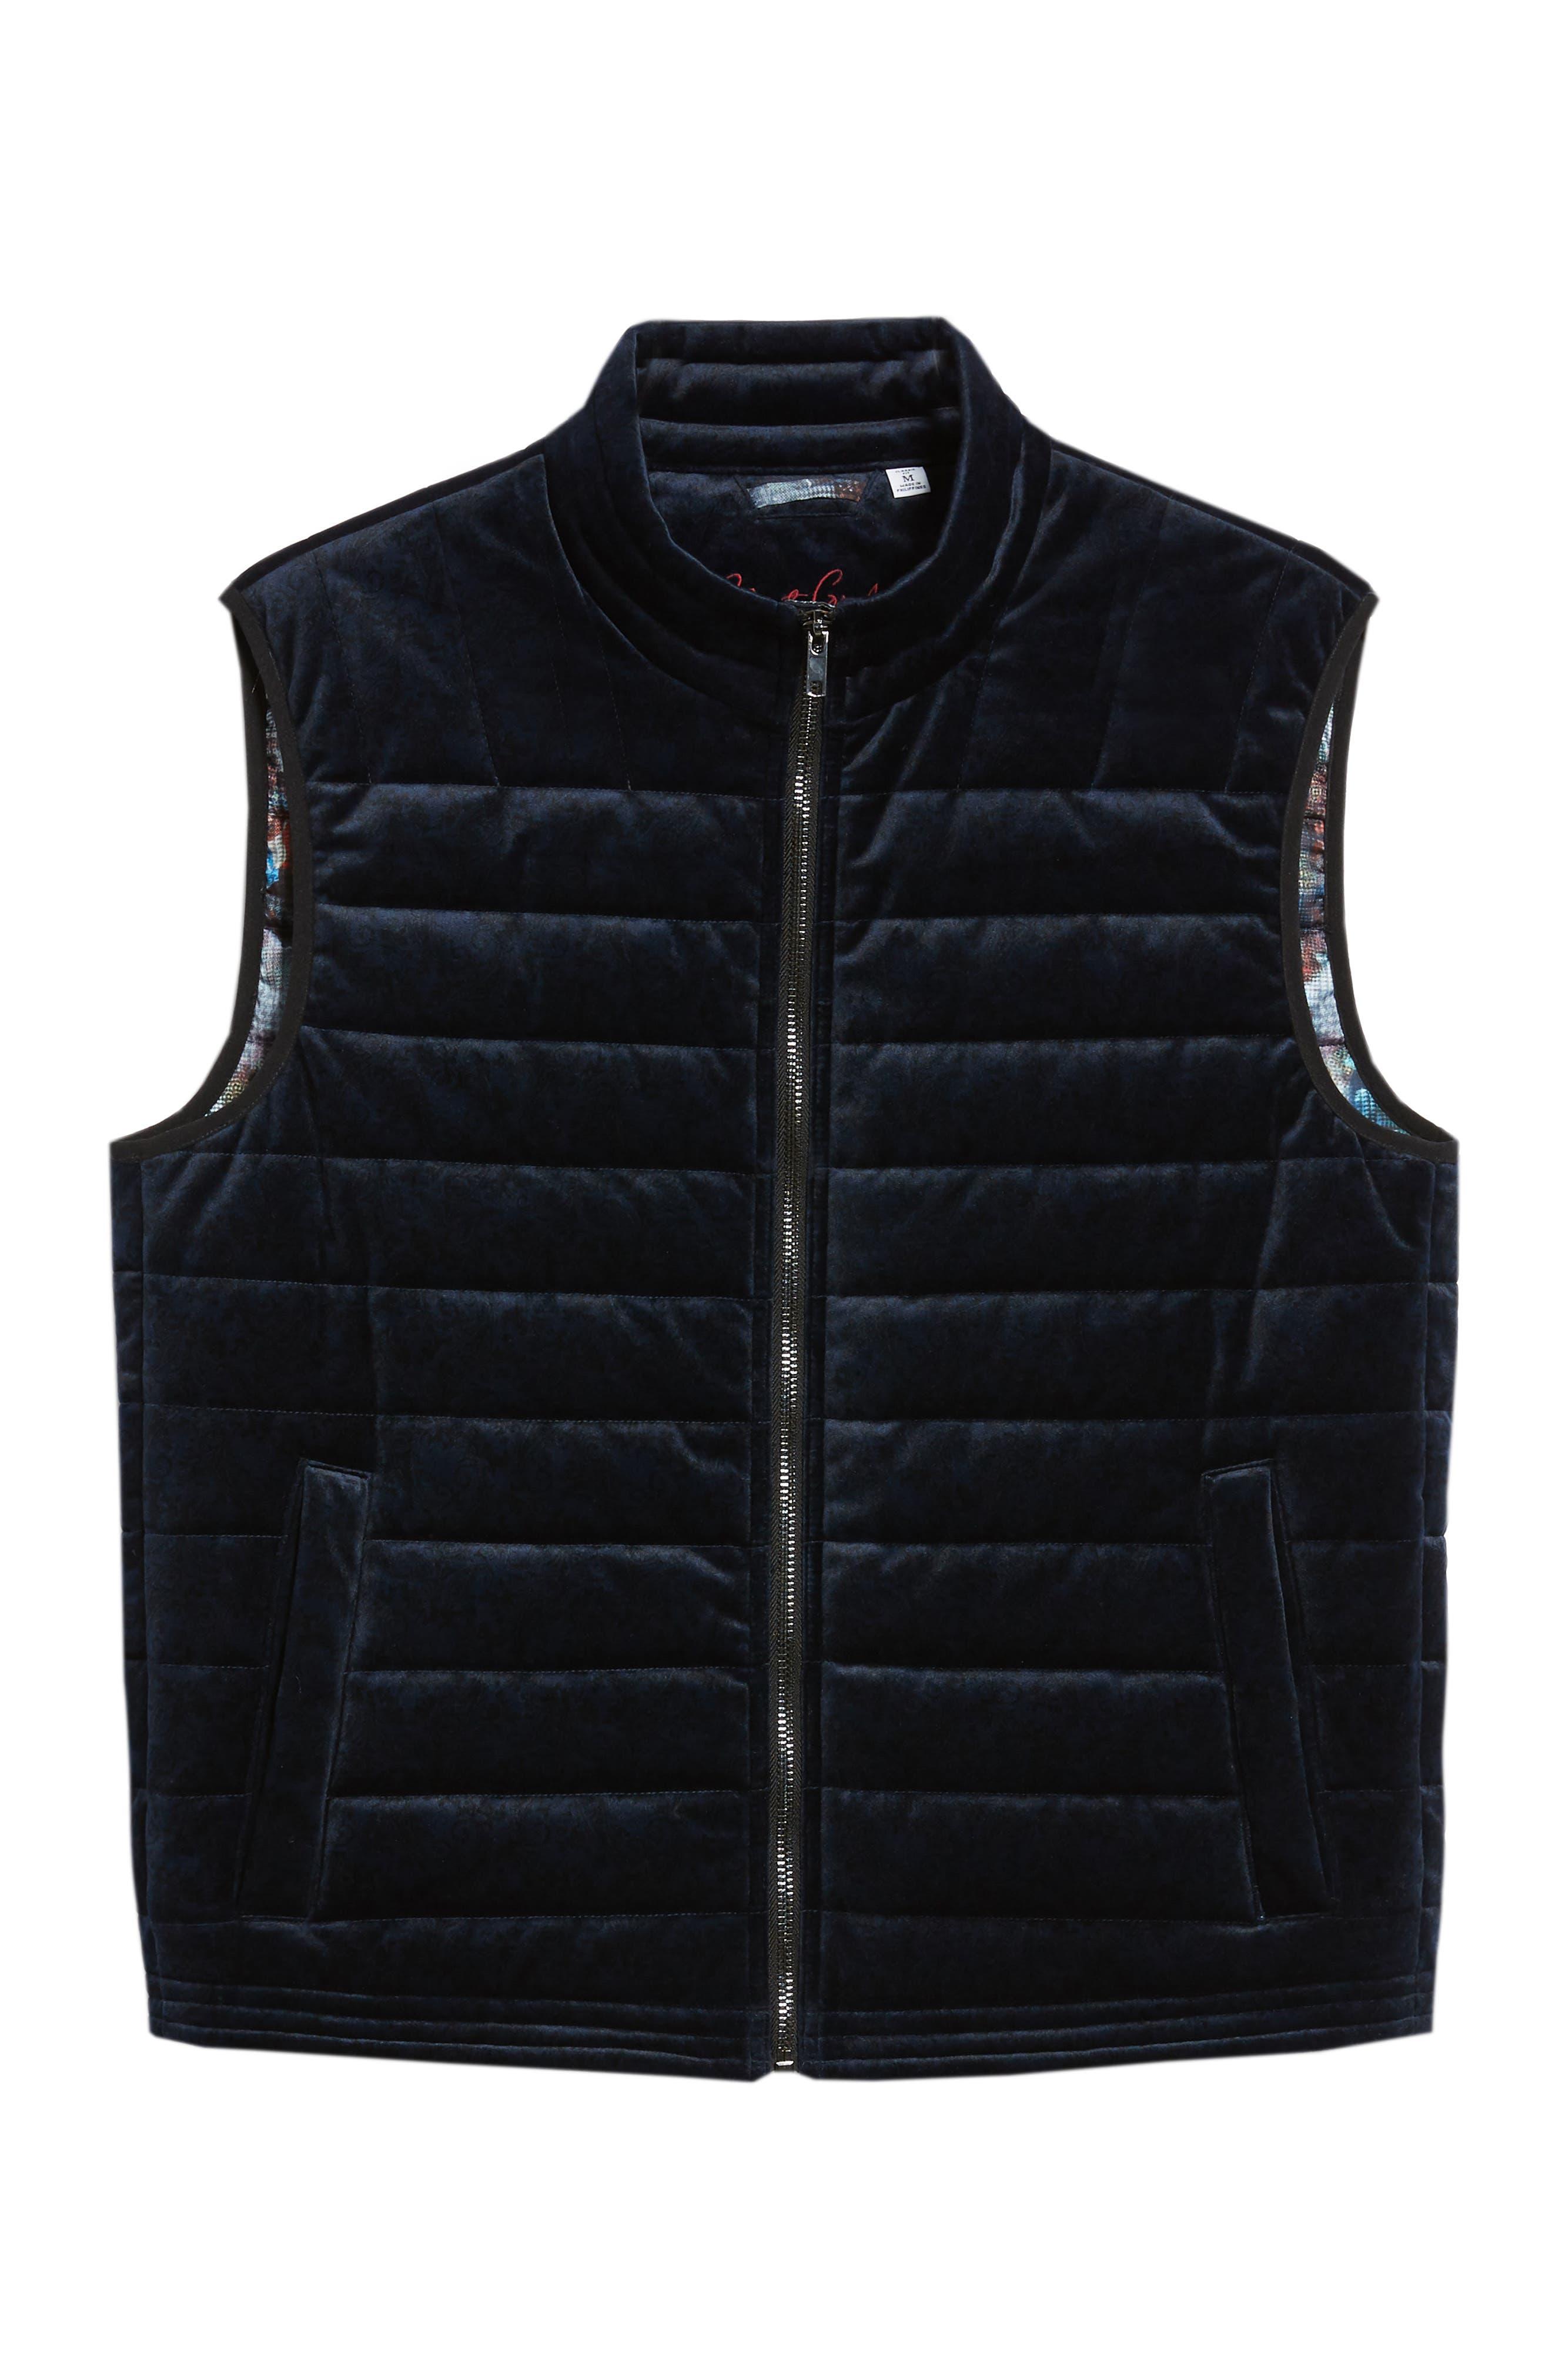 ROBERT GRAHAM,                             Guiffery Classic Fit Quilted Vest,                             Alternate thumbnail 5, color,                             410